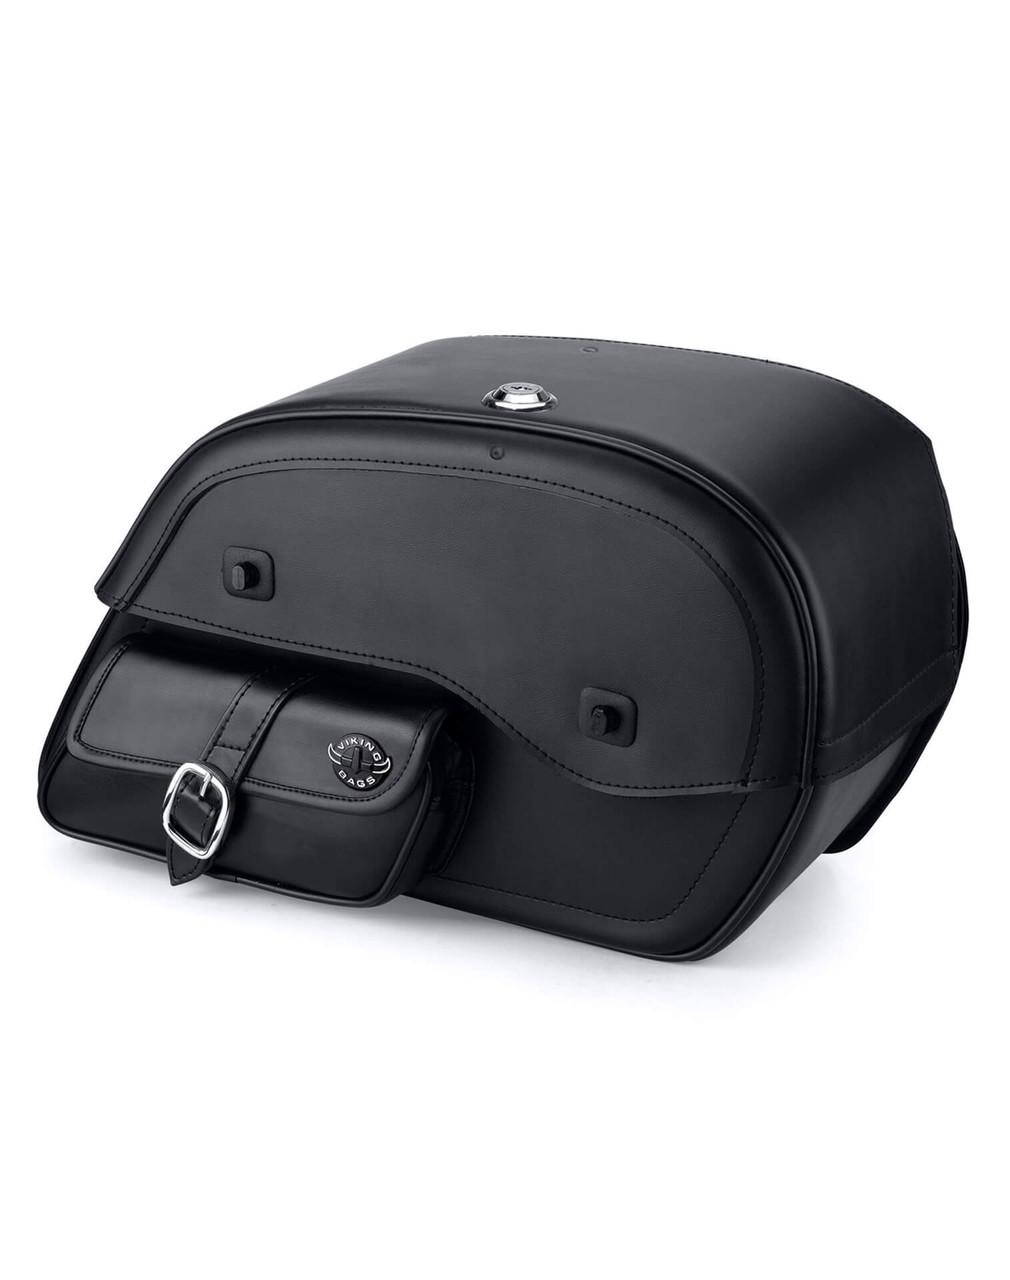 Viking Side Pocket Large Motorcycle Saddlebags For Harley Softail Springer FXSTS Main Bag View